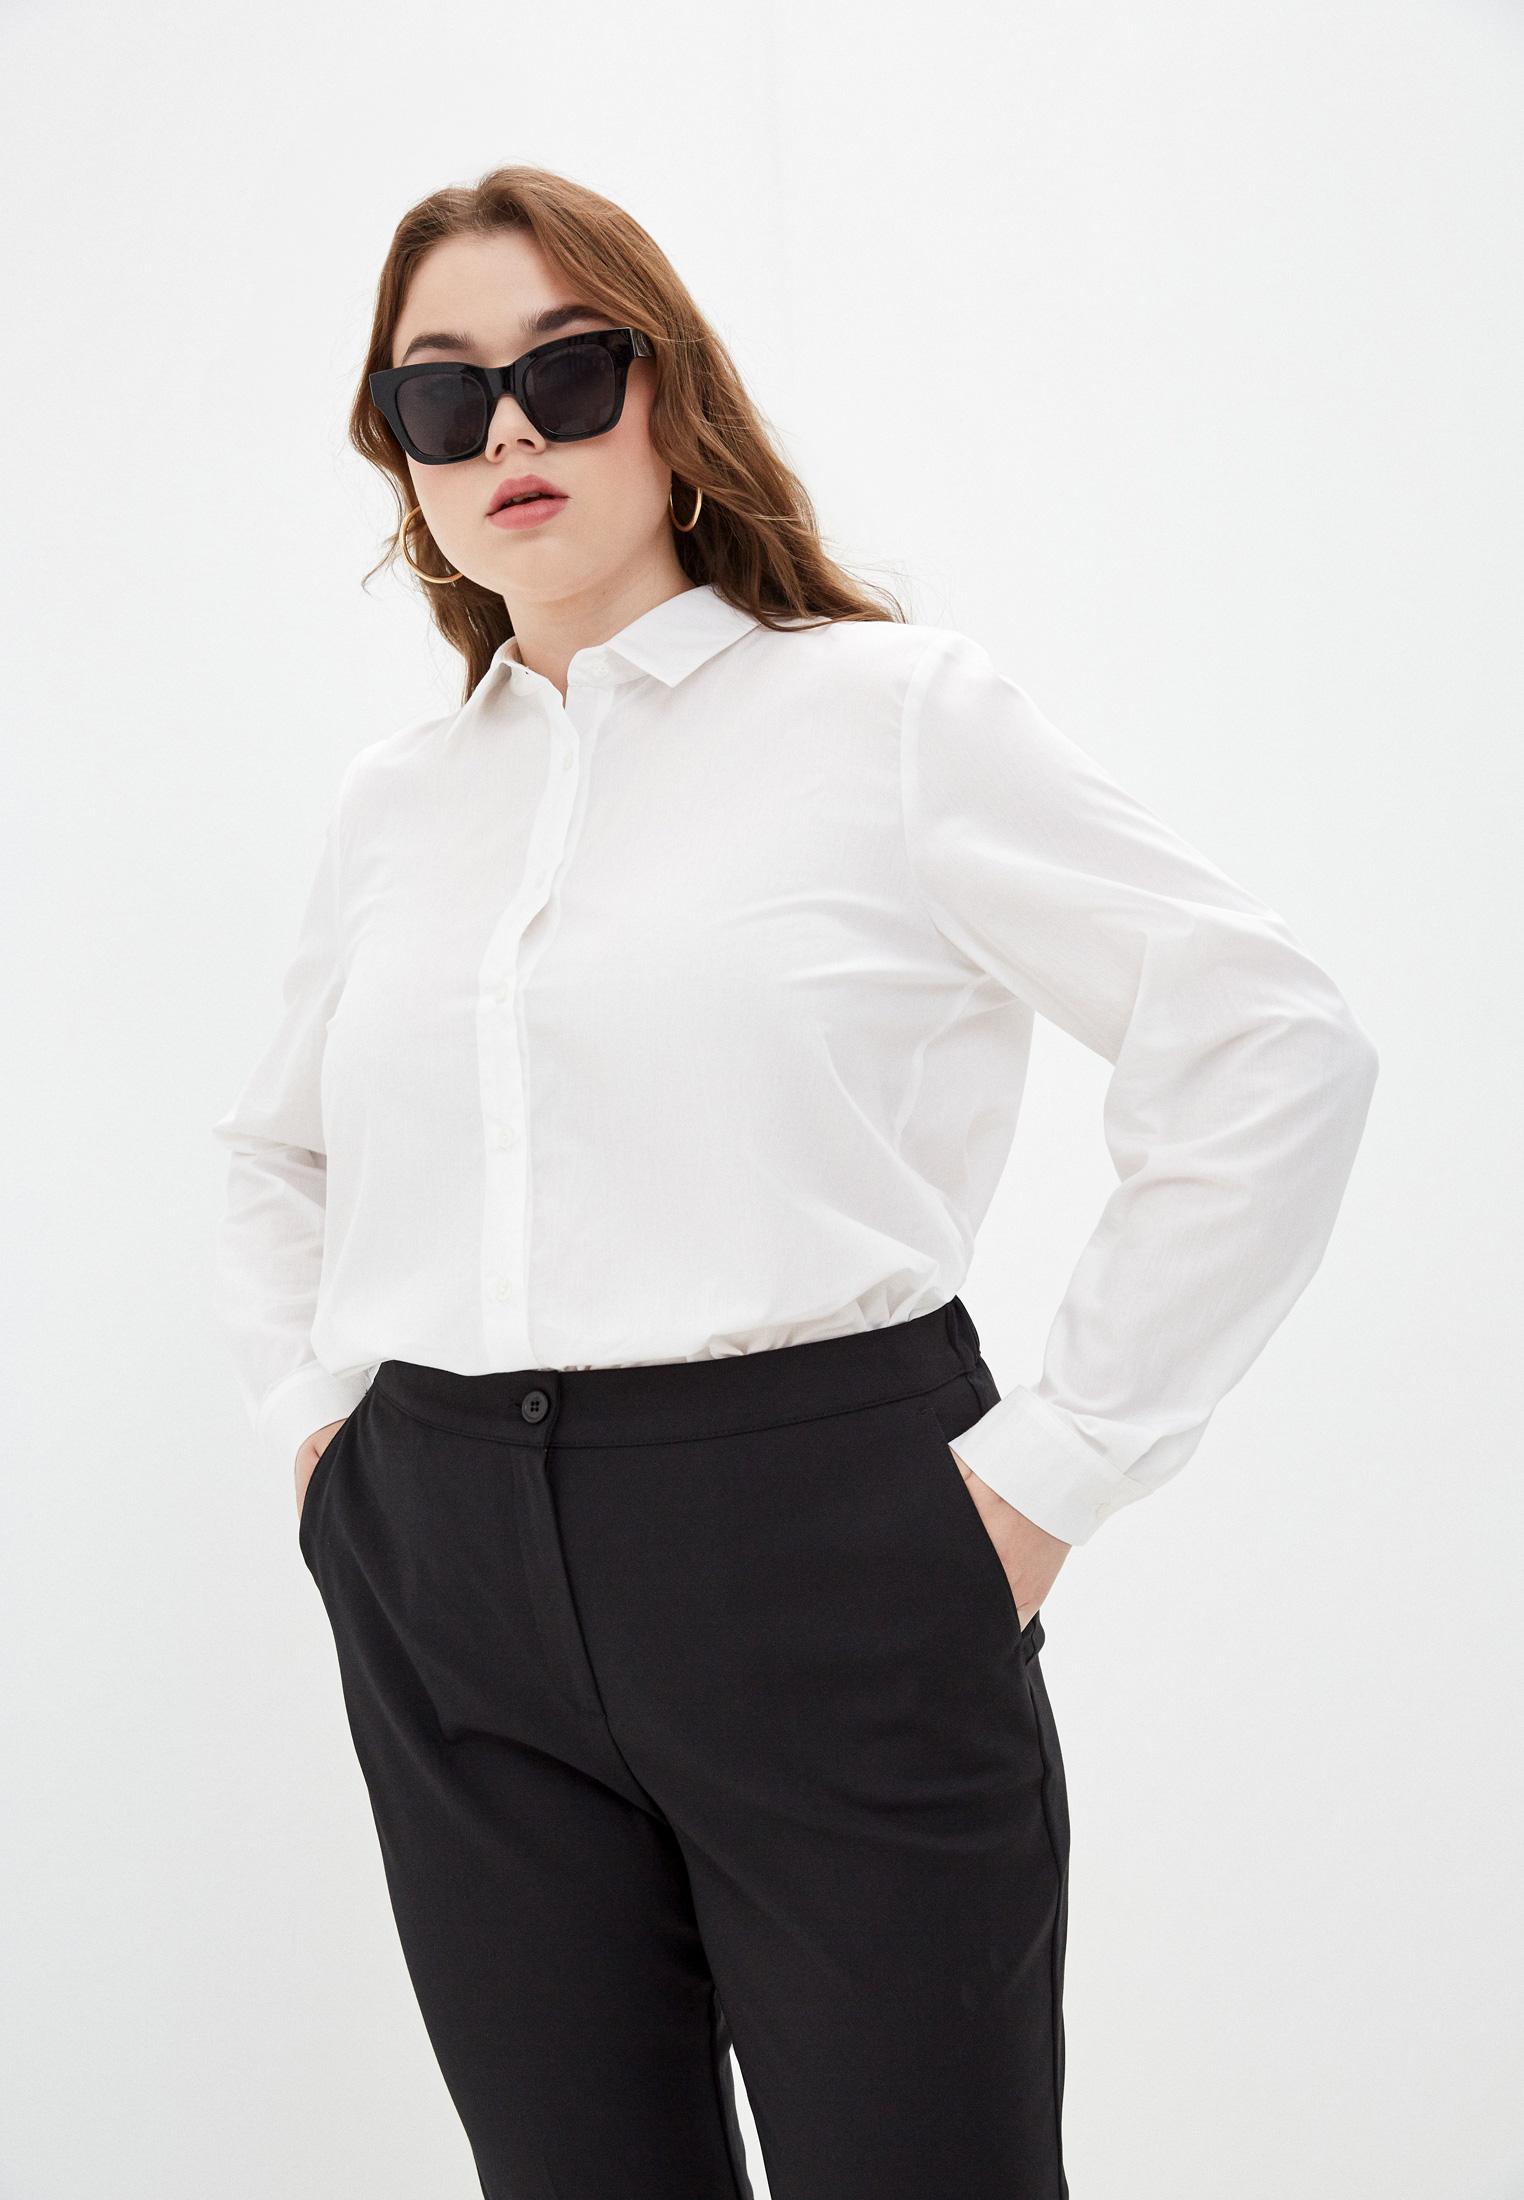 Женские рубашки с длинным рукавом Persona by Marina Rinaldi Рубашка Persona by Marina Rinaldi